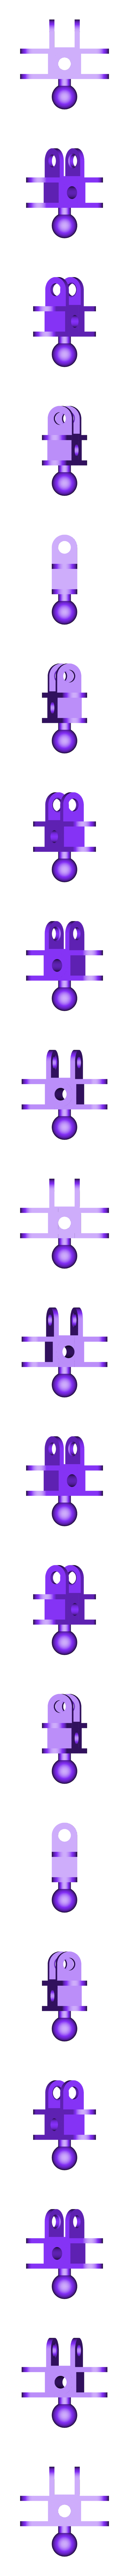 clip_x3_ball_x1.stl Download free STL file ChainClip Construction Set • 3D print template, ferjerez3d